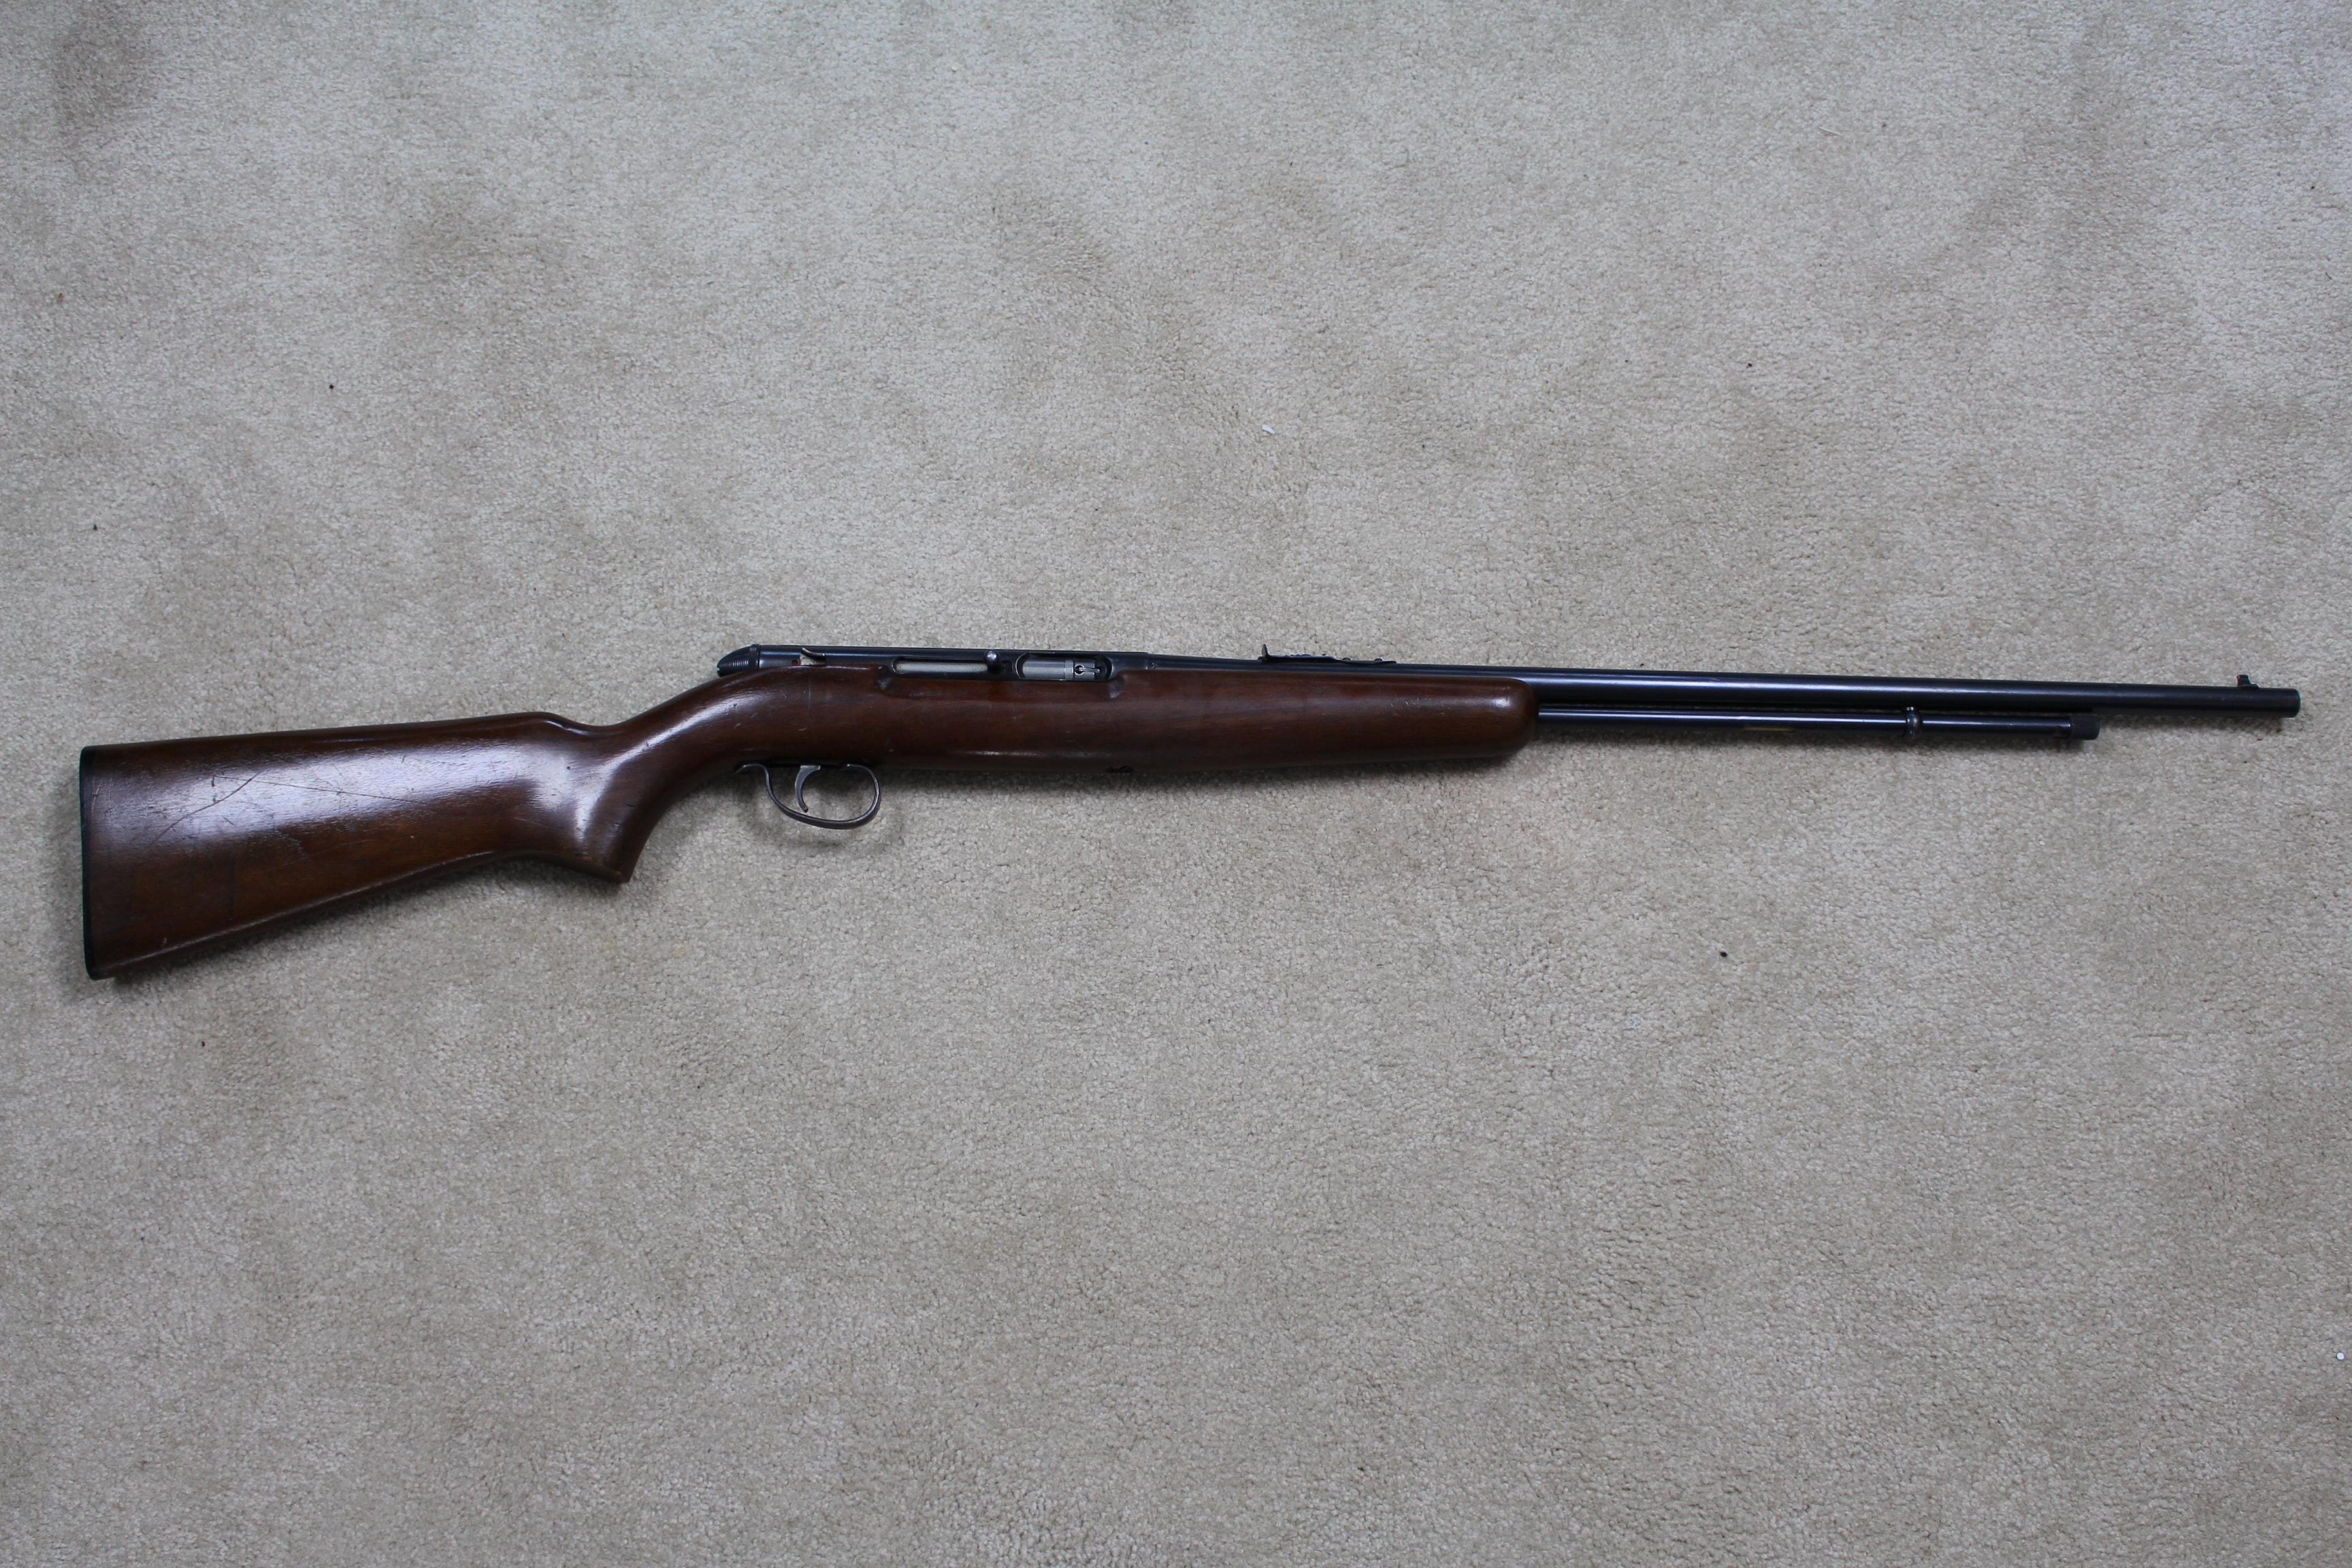 _Remington Model 550-1 Rimfire Semi-auto Rifle -  22 Short, Long, Long Rifle